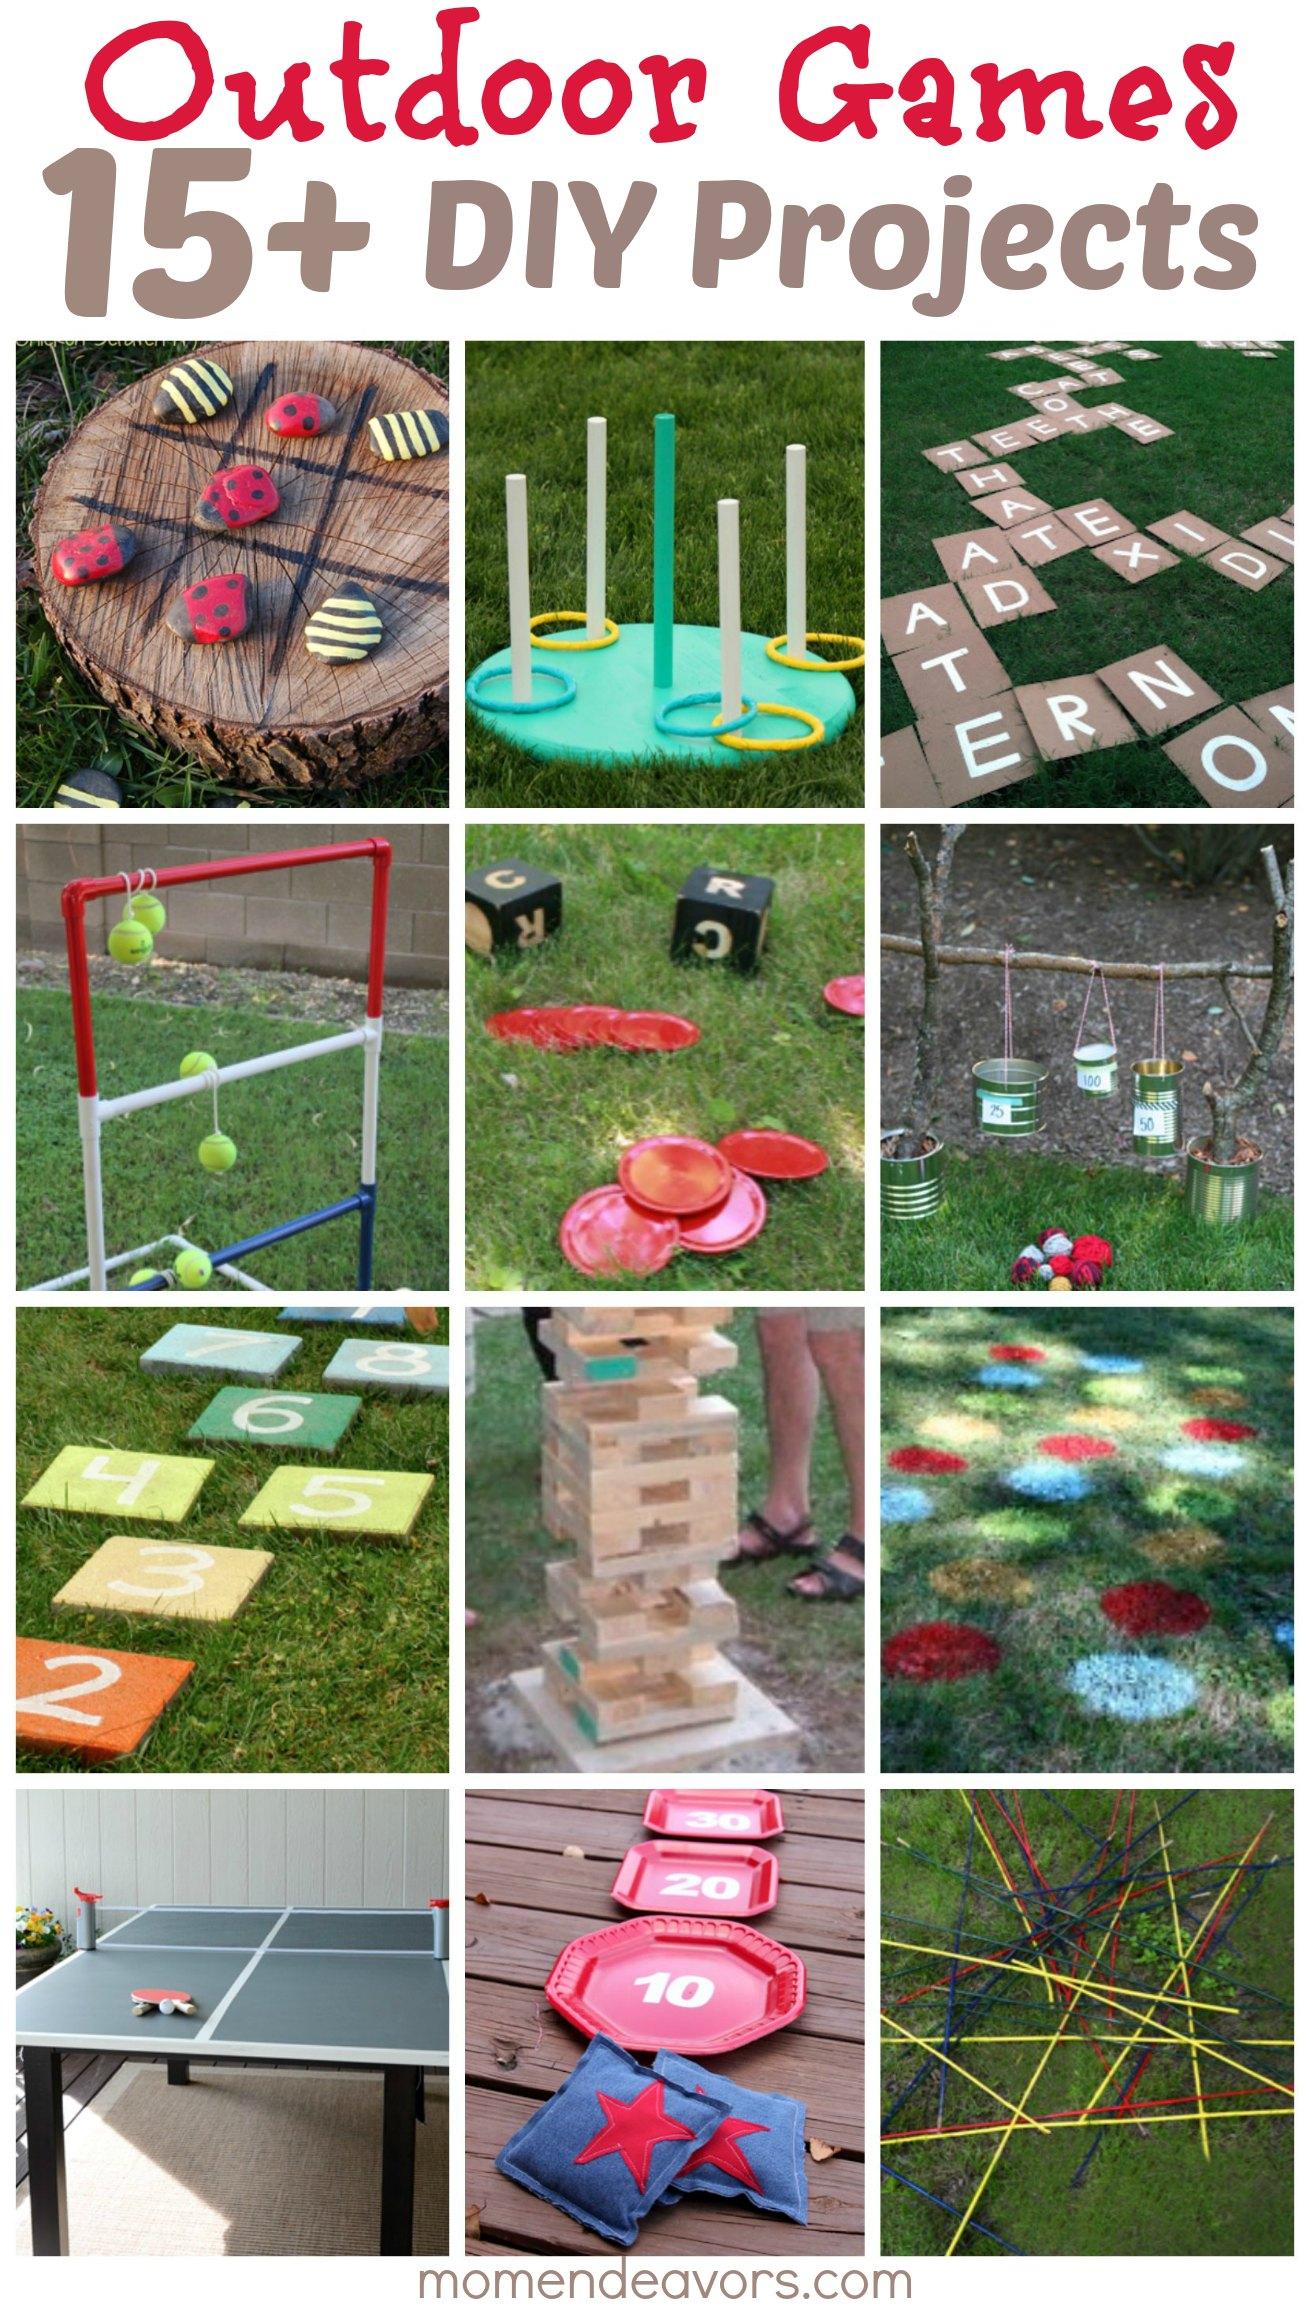 Relieving Backyard Backyard Design Ideas Backyard Ideas Pinterest Diy Outdoor Games Diy Outdoor Games Project Ideas outdoor Backyard Fun Ideas